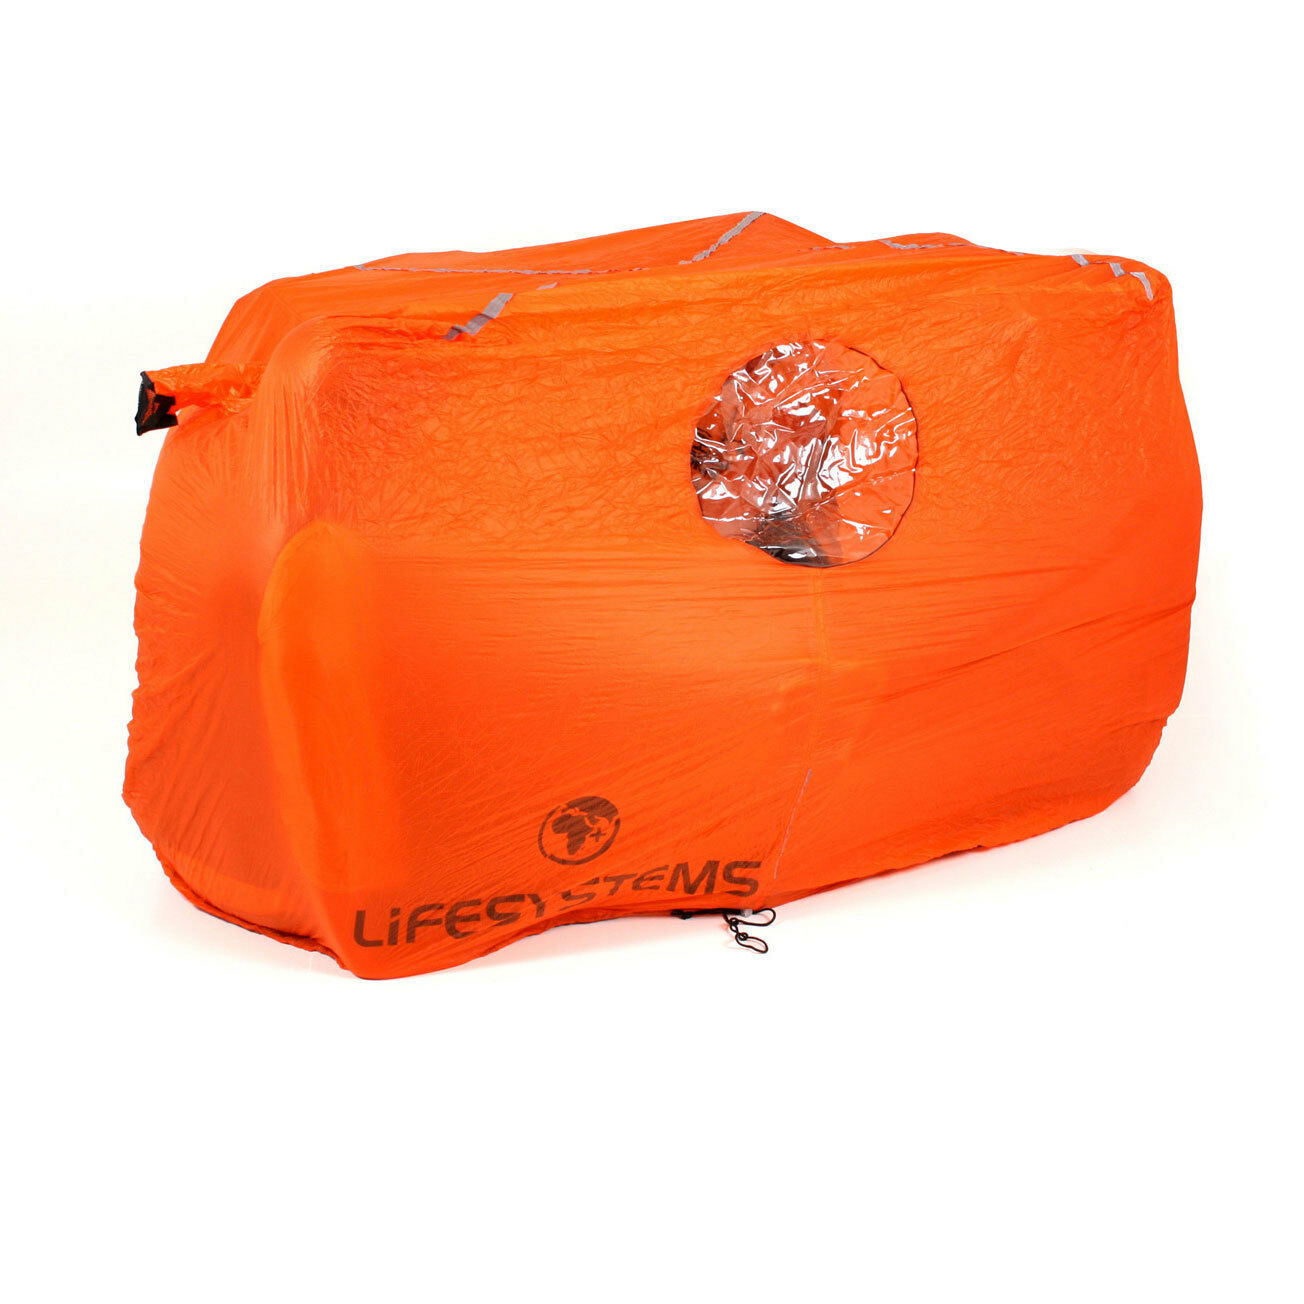 Lifesystems 4-6 Survival Person Survival 4-6 Shelter - Orange 5f03a8